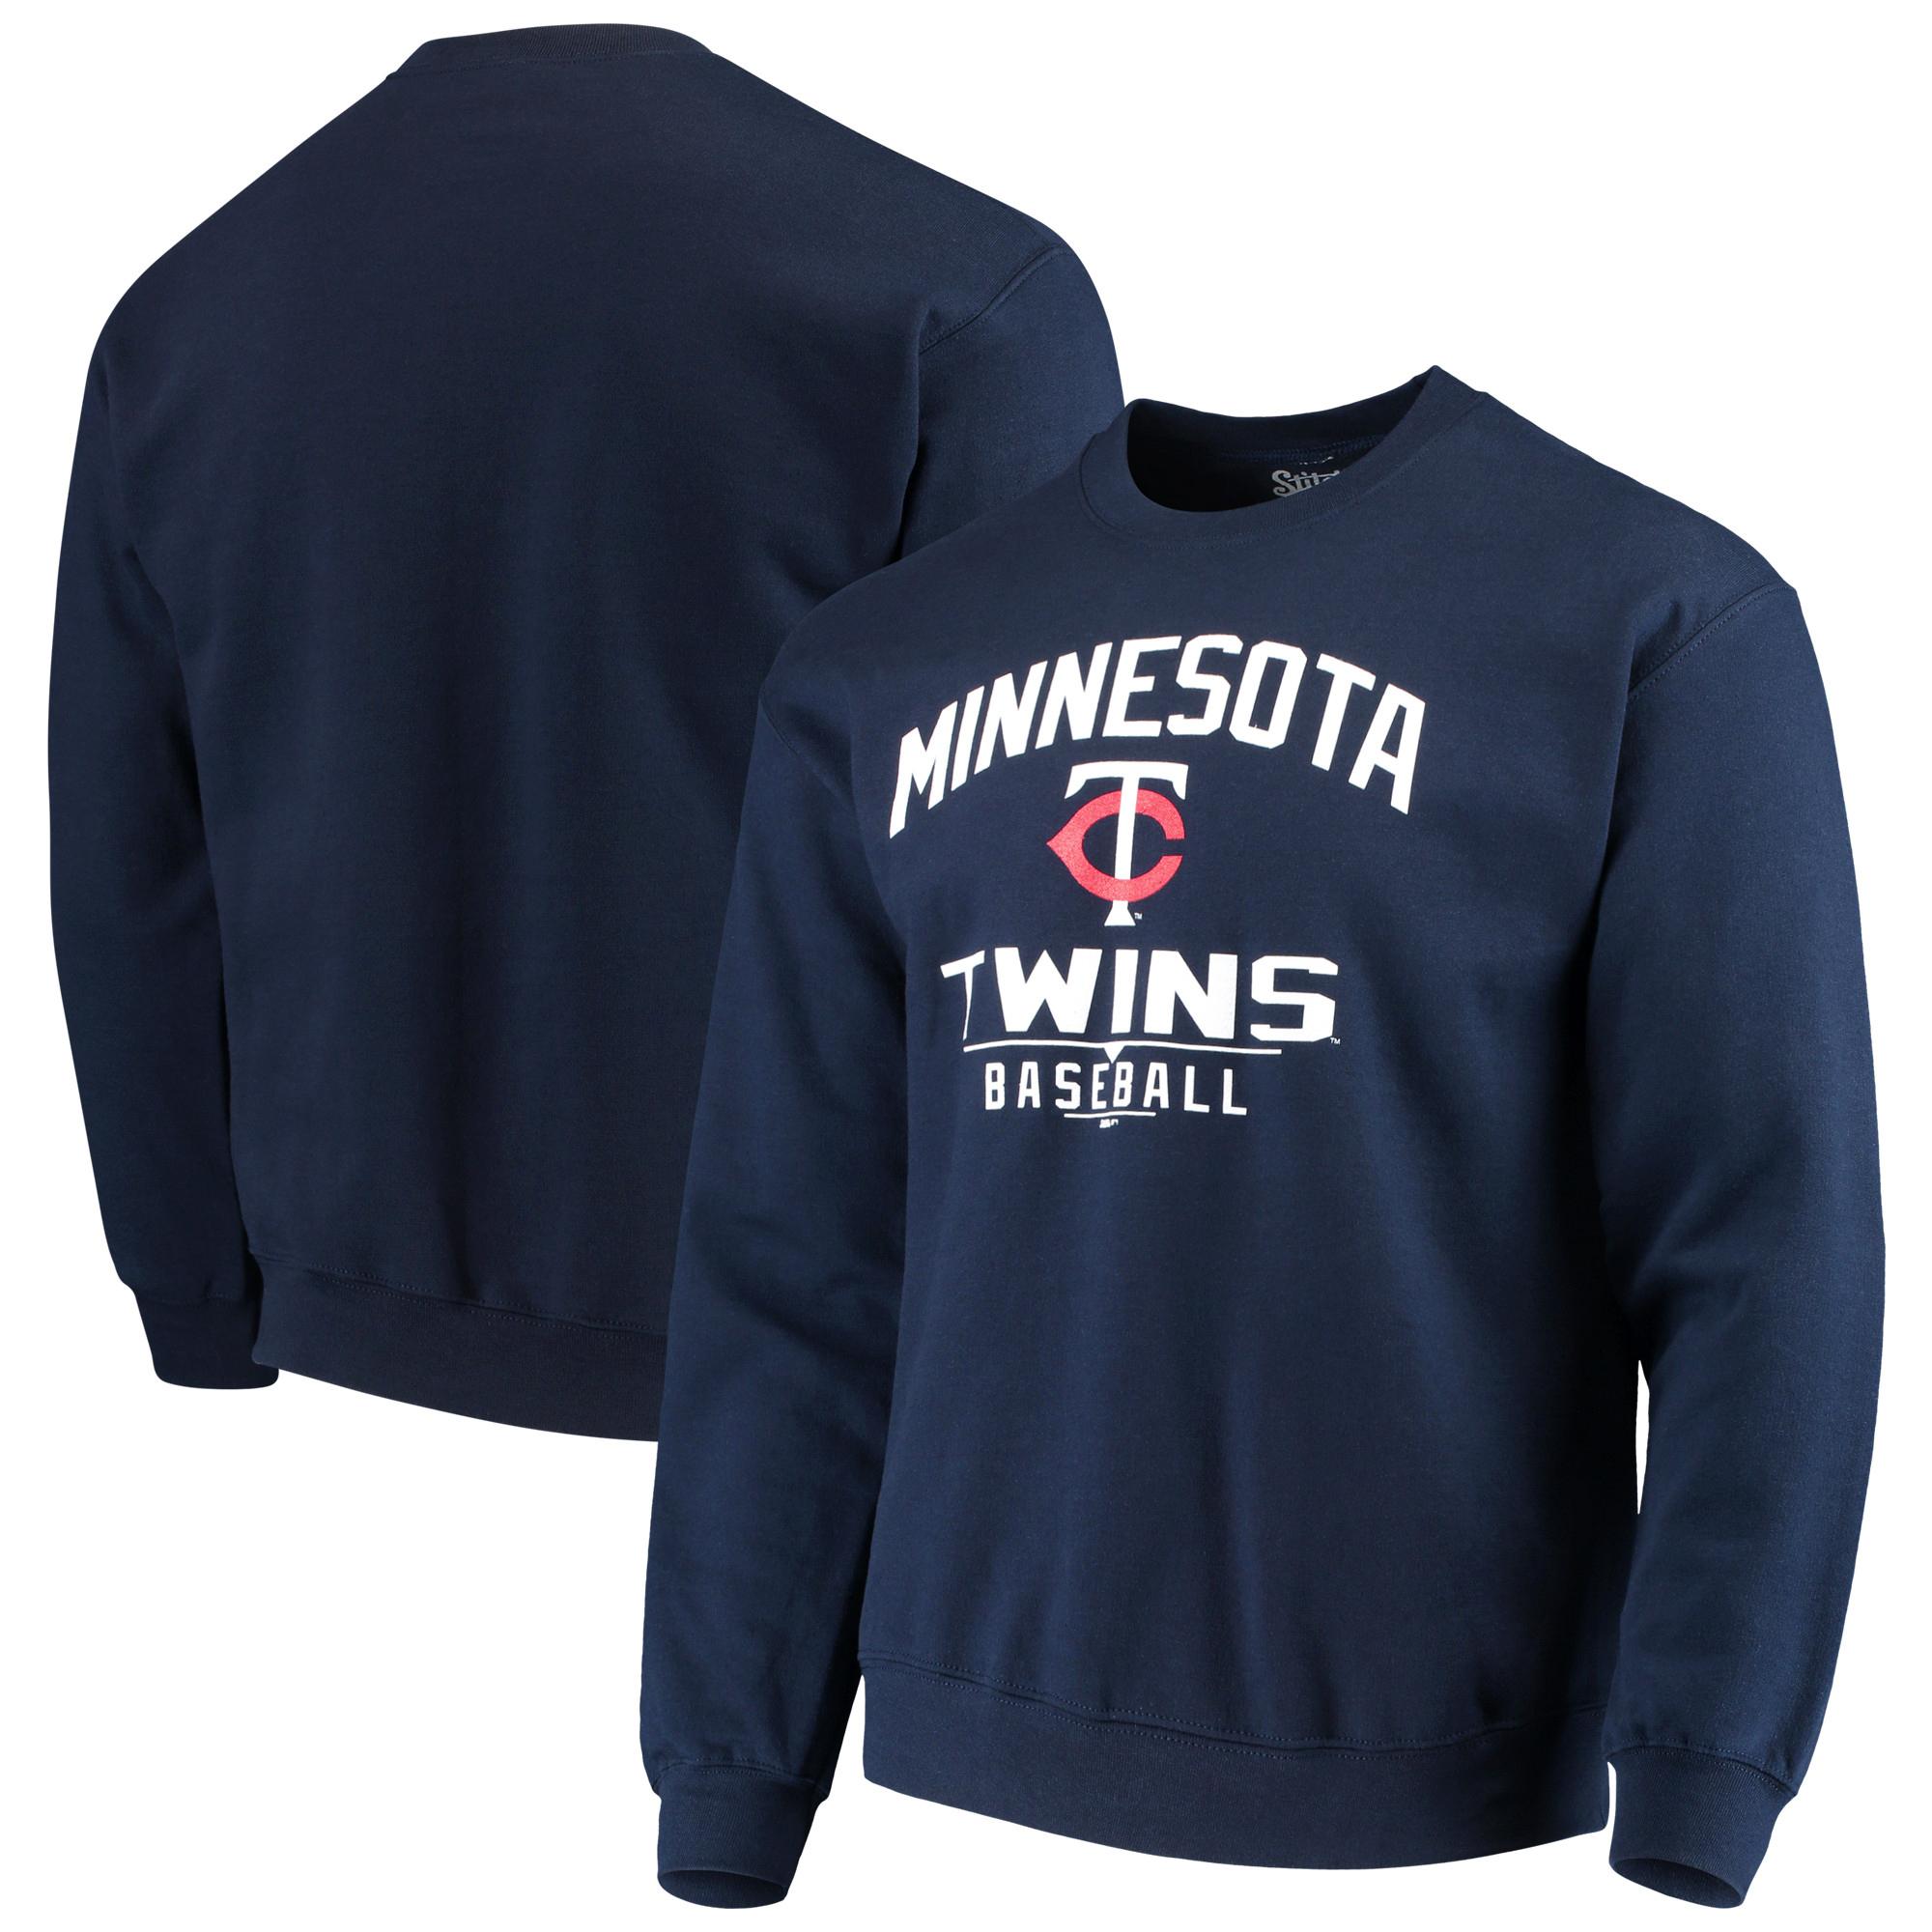 Minnesota Twins Stitches Holiday Pullover Crew Sweatshirt - Navy